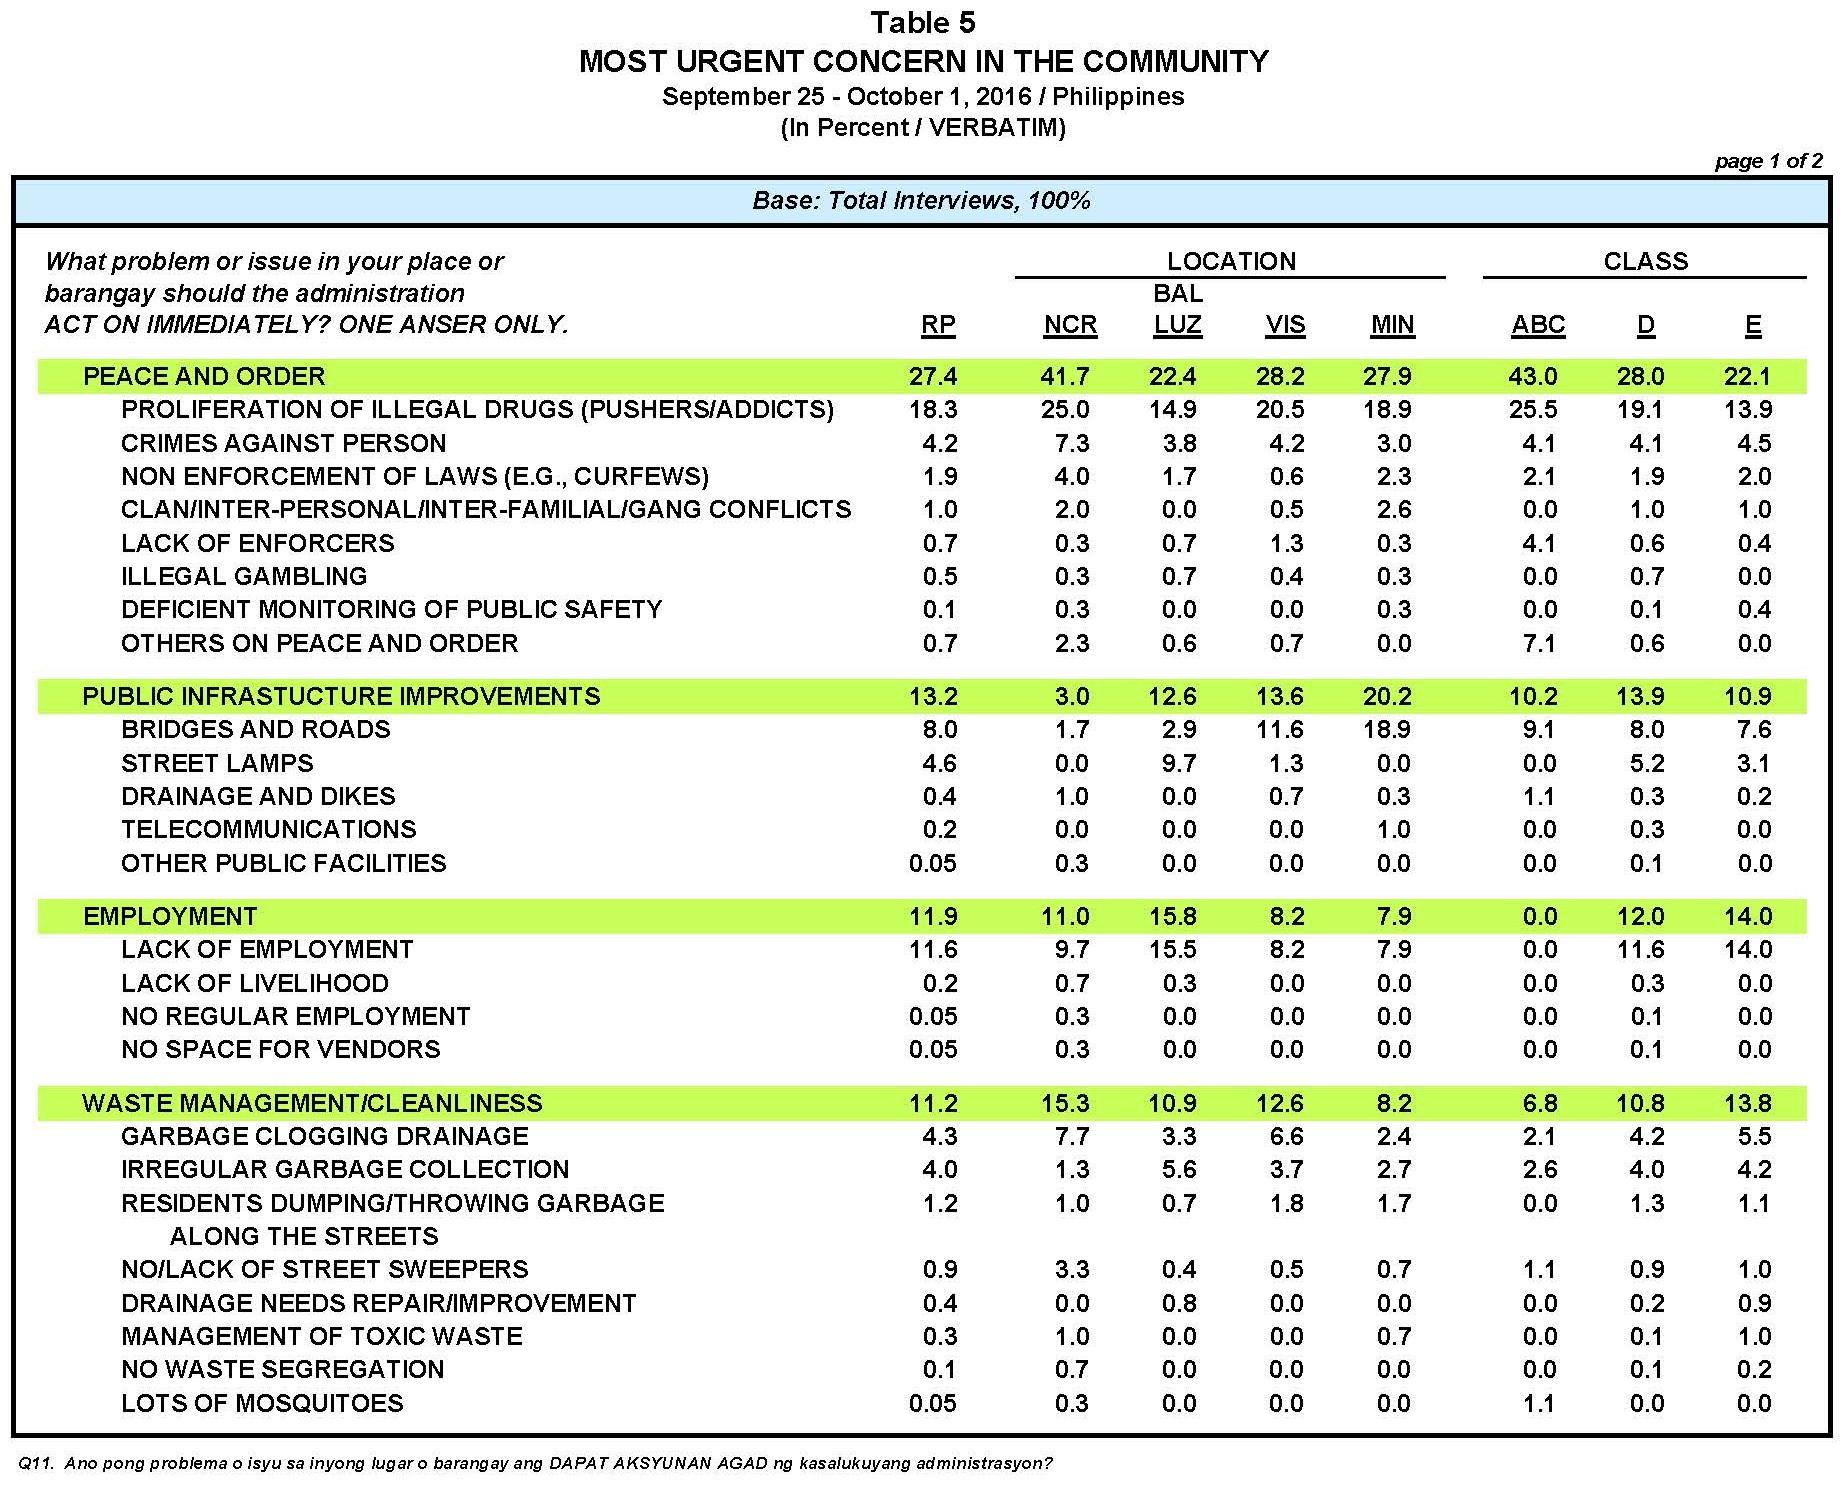 UB1609 MR2 Urgent Concerns Table 5 1